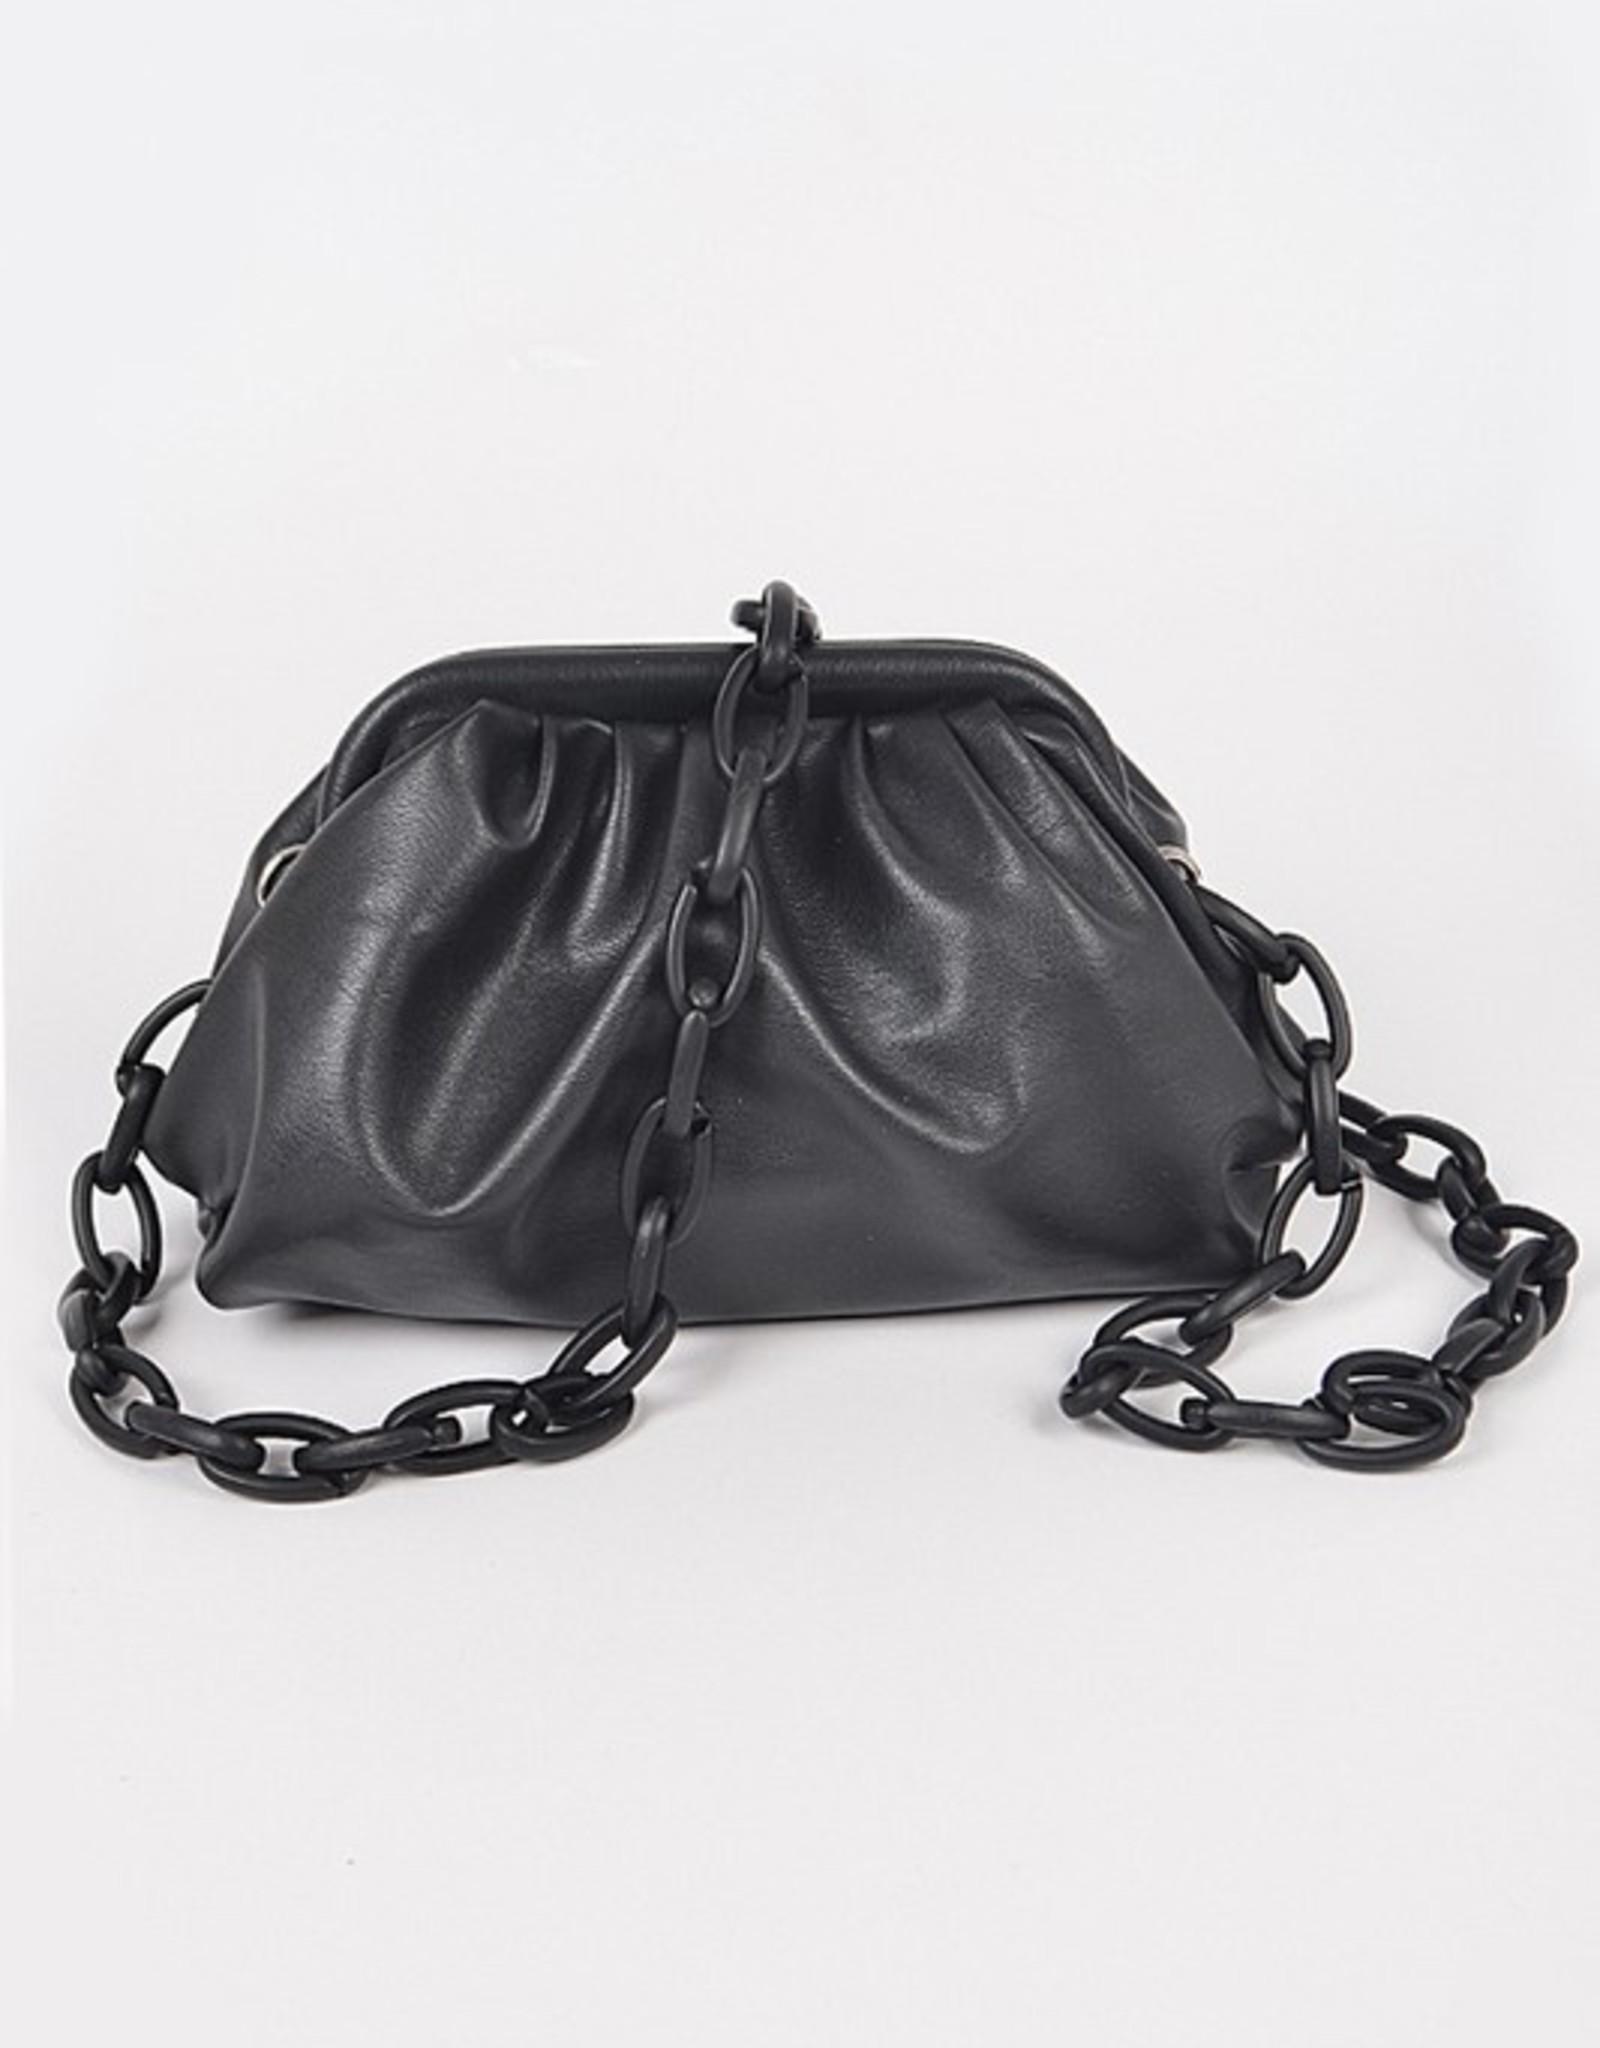 Chain strap clutch